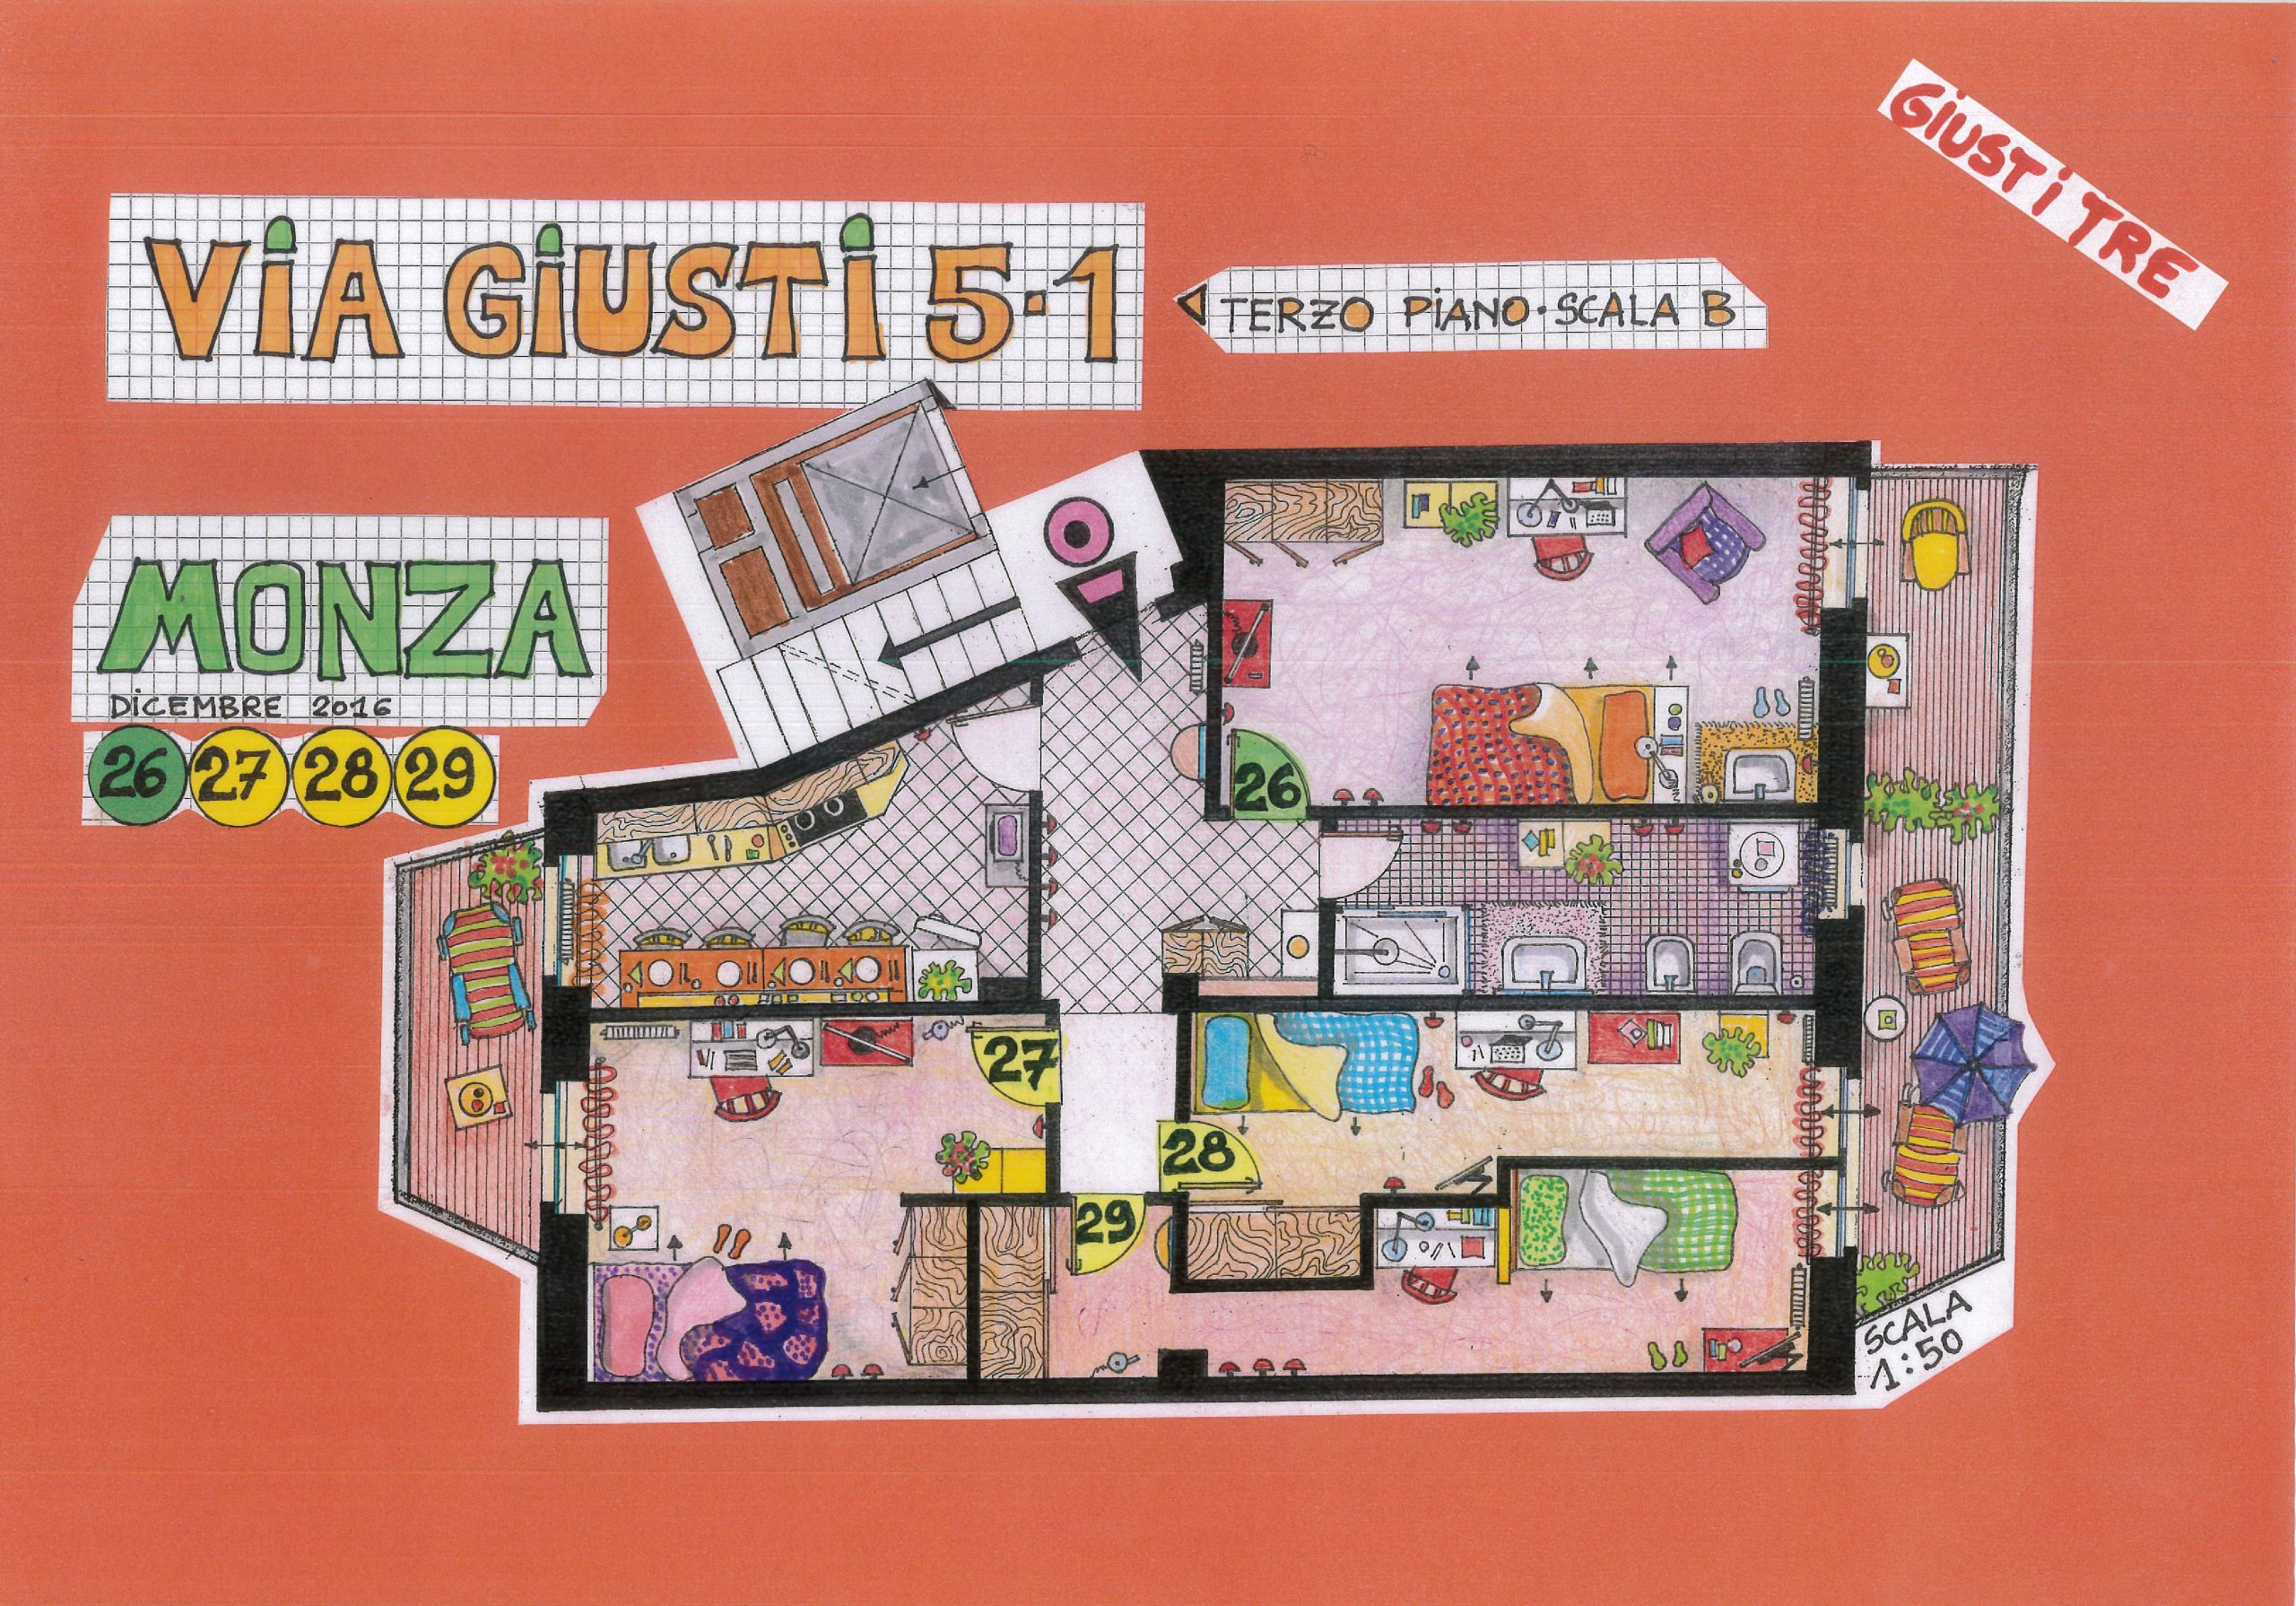 Via Giusti  – III Piano Stanze 26-29